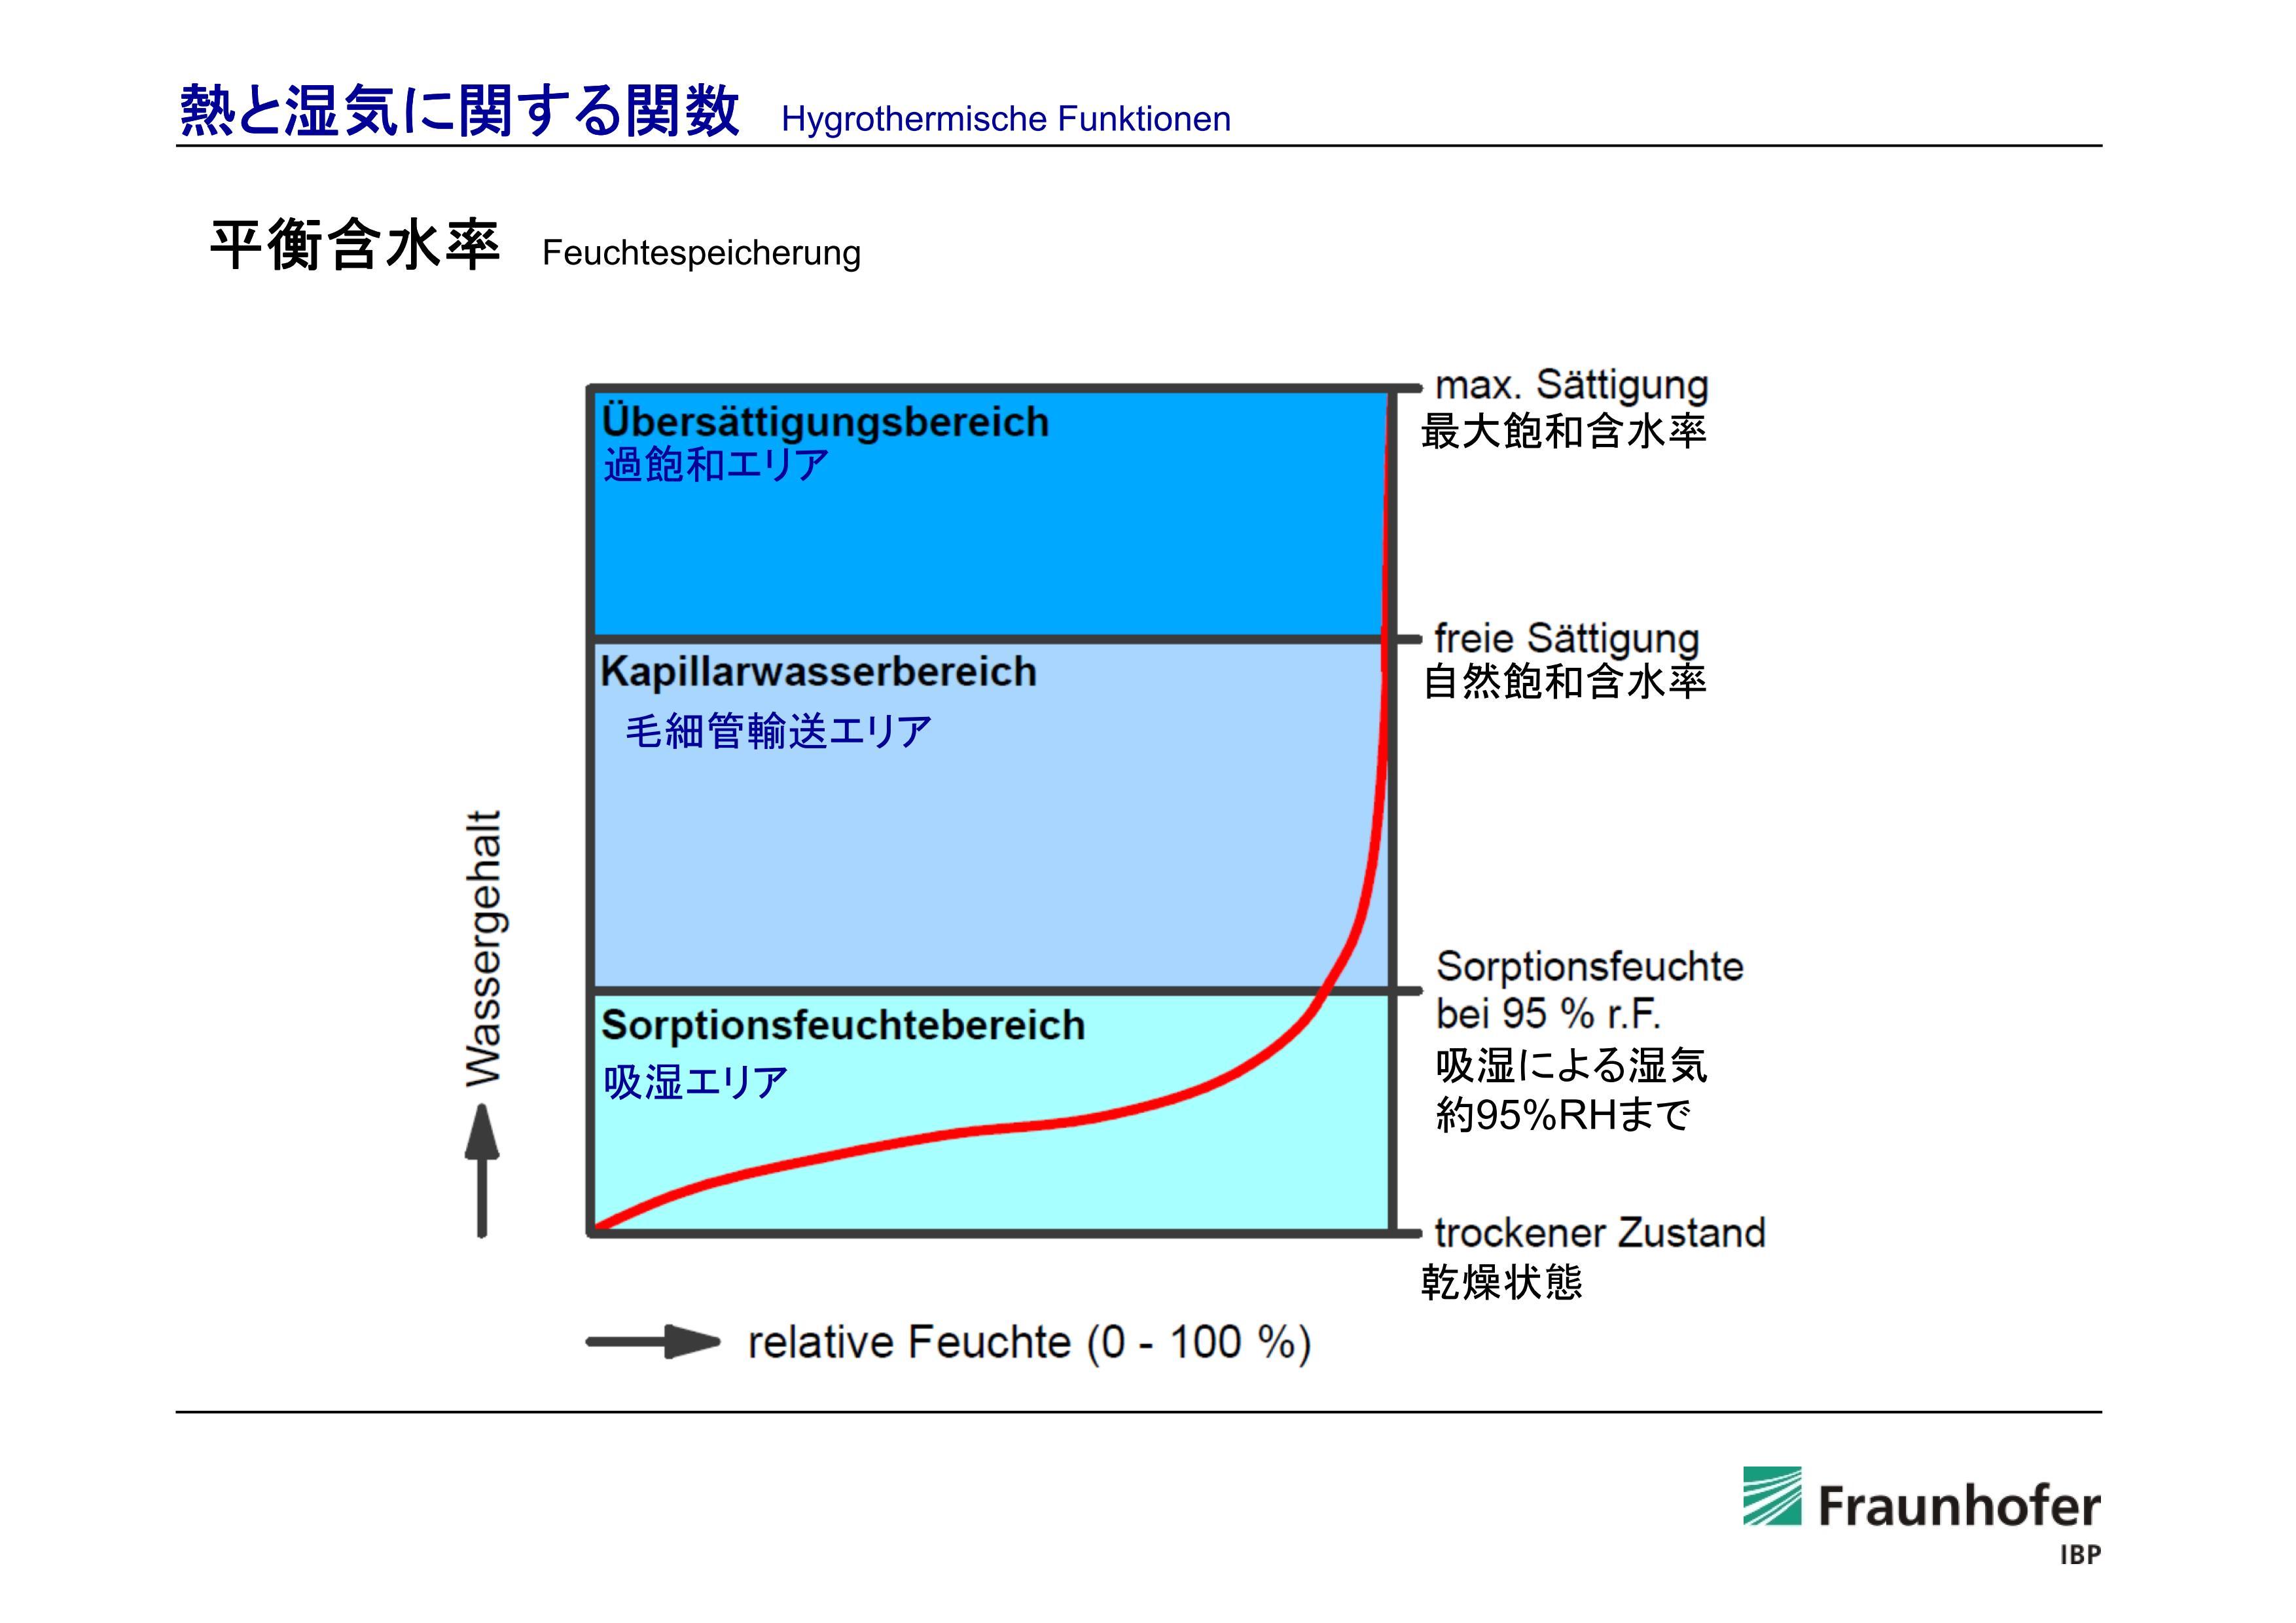 1_Material%20database%20%5BKompatibilit%C3%A4tsmodus%5D_19.jpg